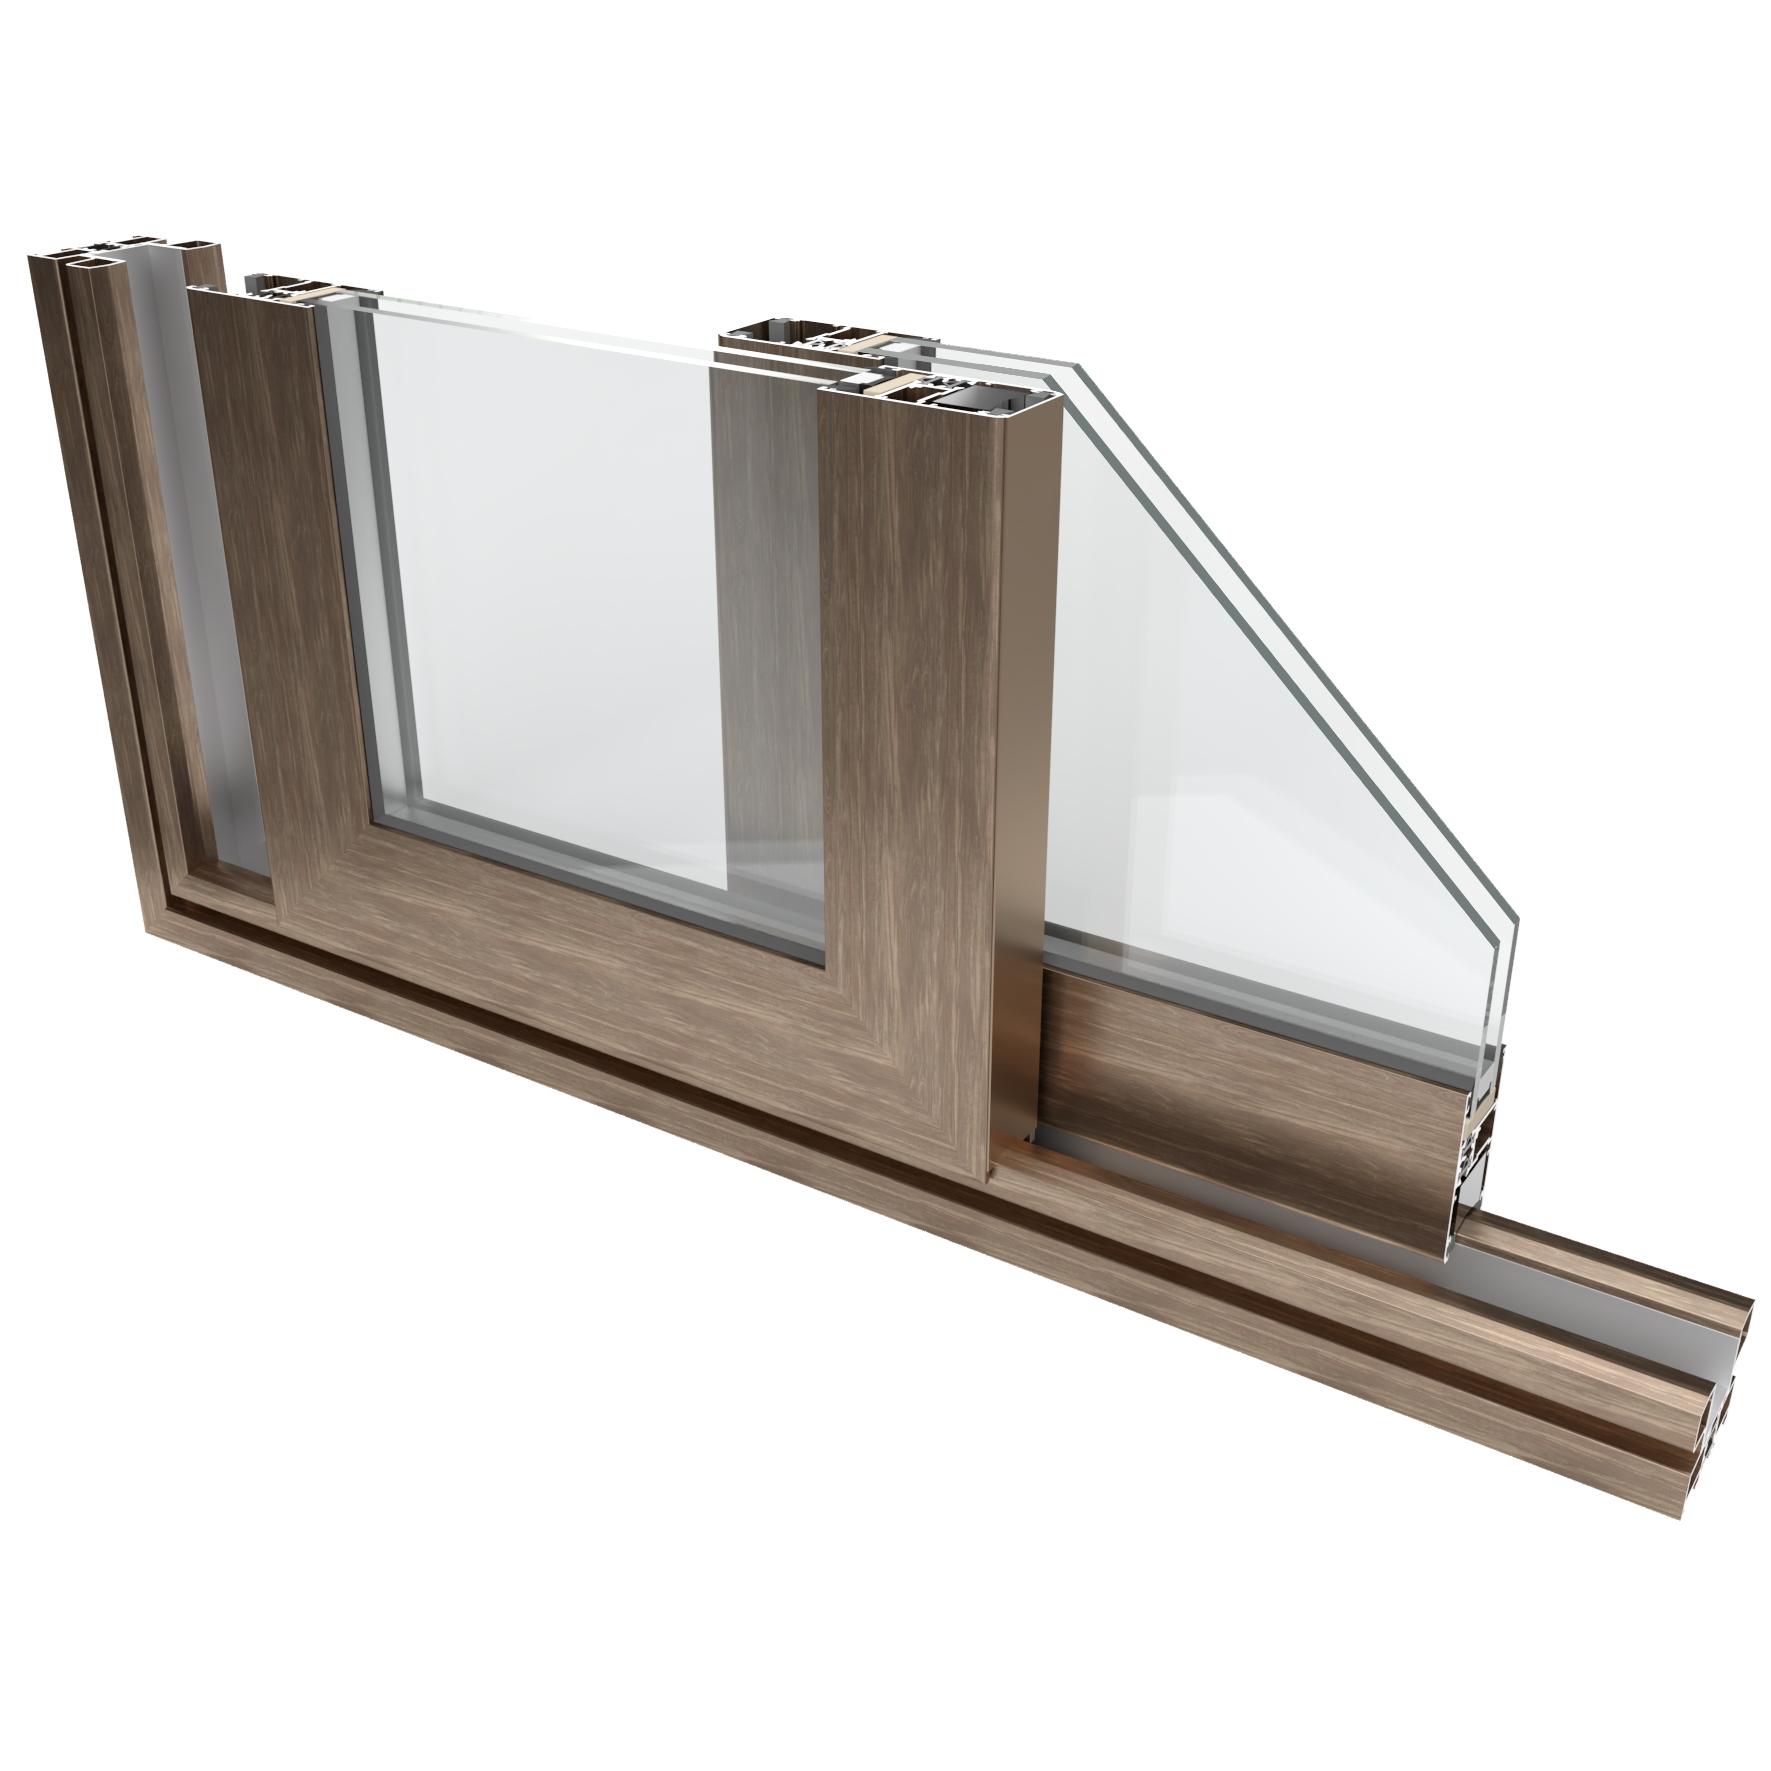 https://www.allpaint.it/wp-content/uploads/2021/07/scorrevoli-alluminio-78sttb-allpaint.jpg